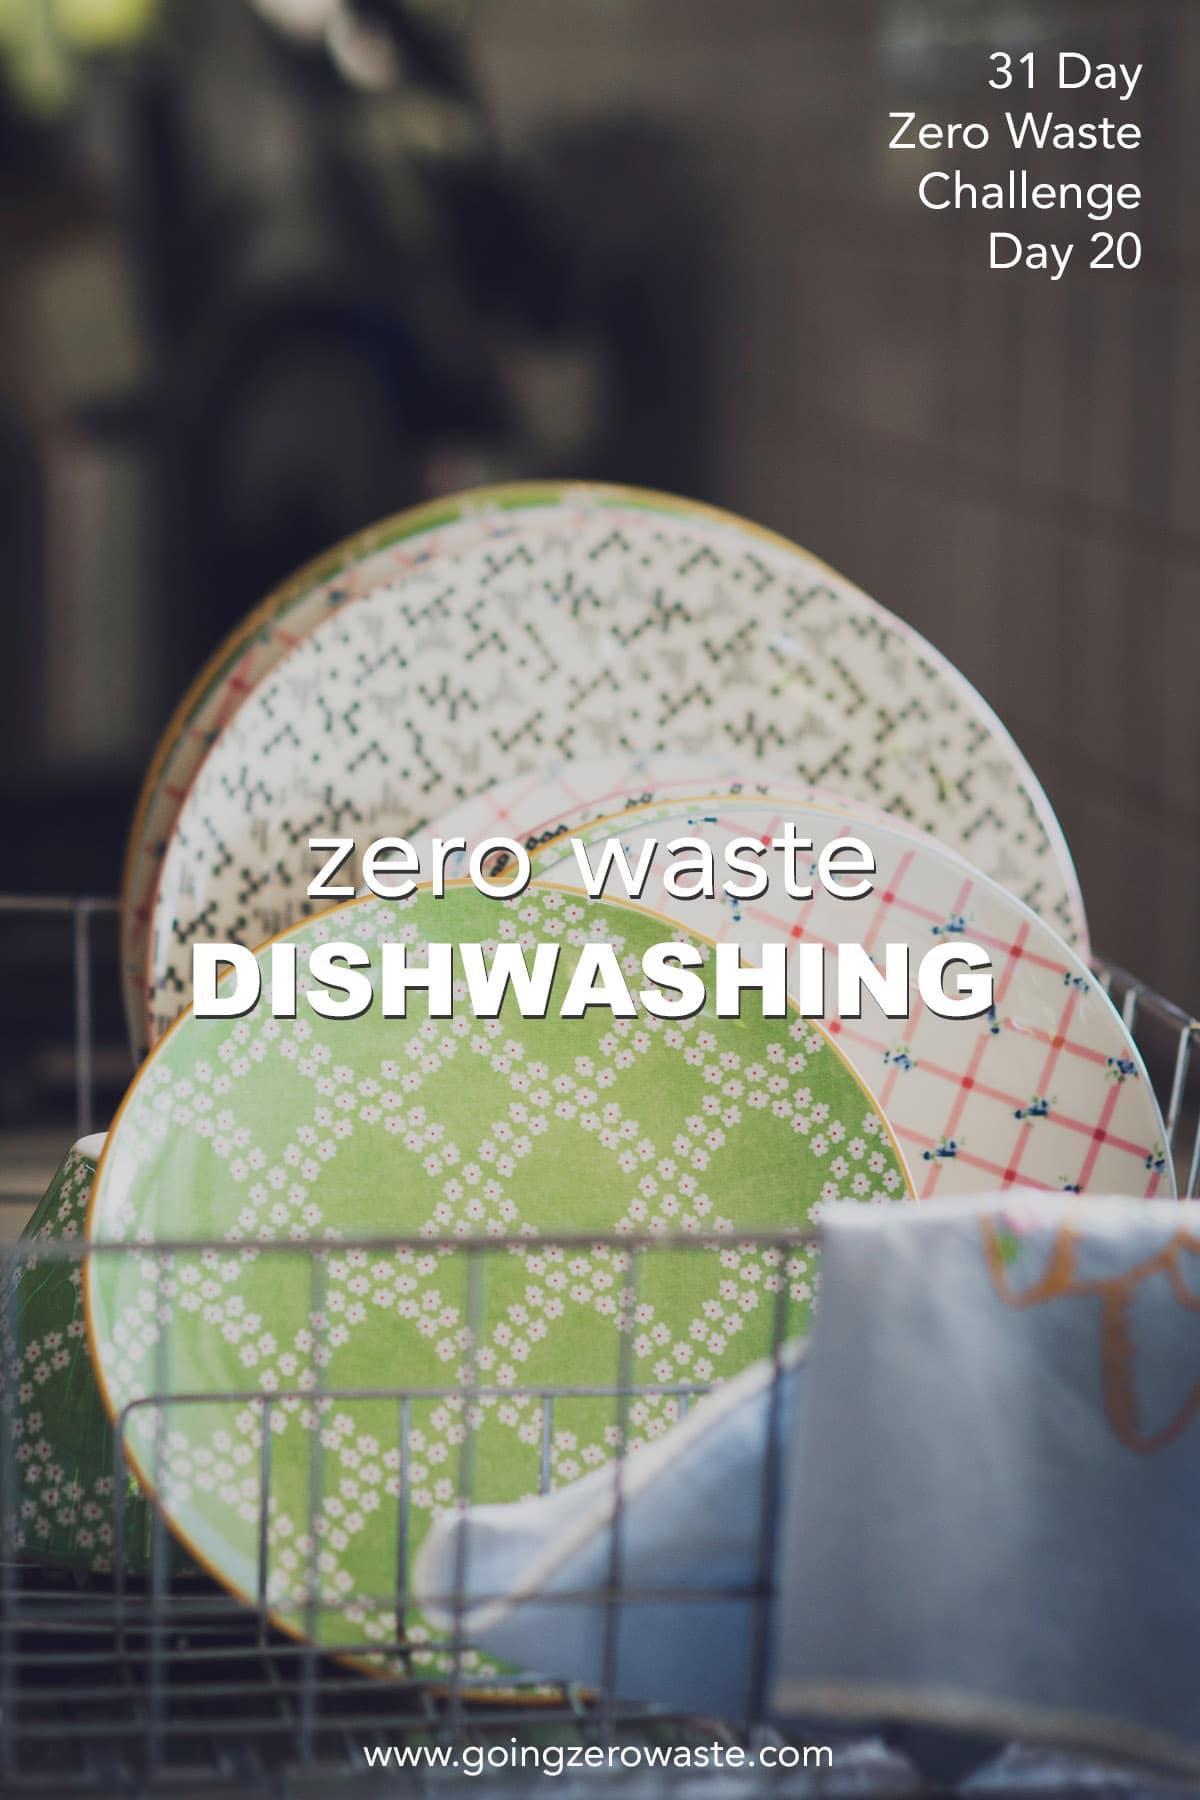 Zero Waste Dishwashing - Day 20 of the Zero Waste Challenge